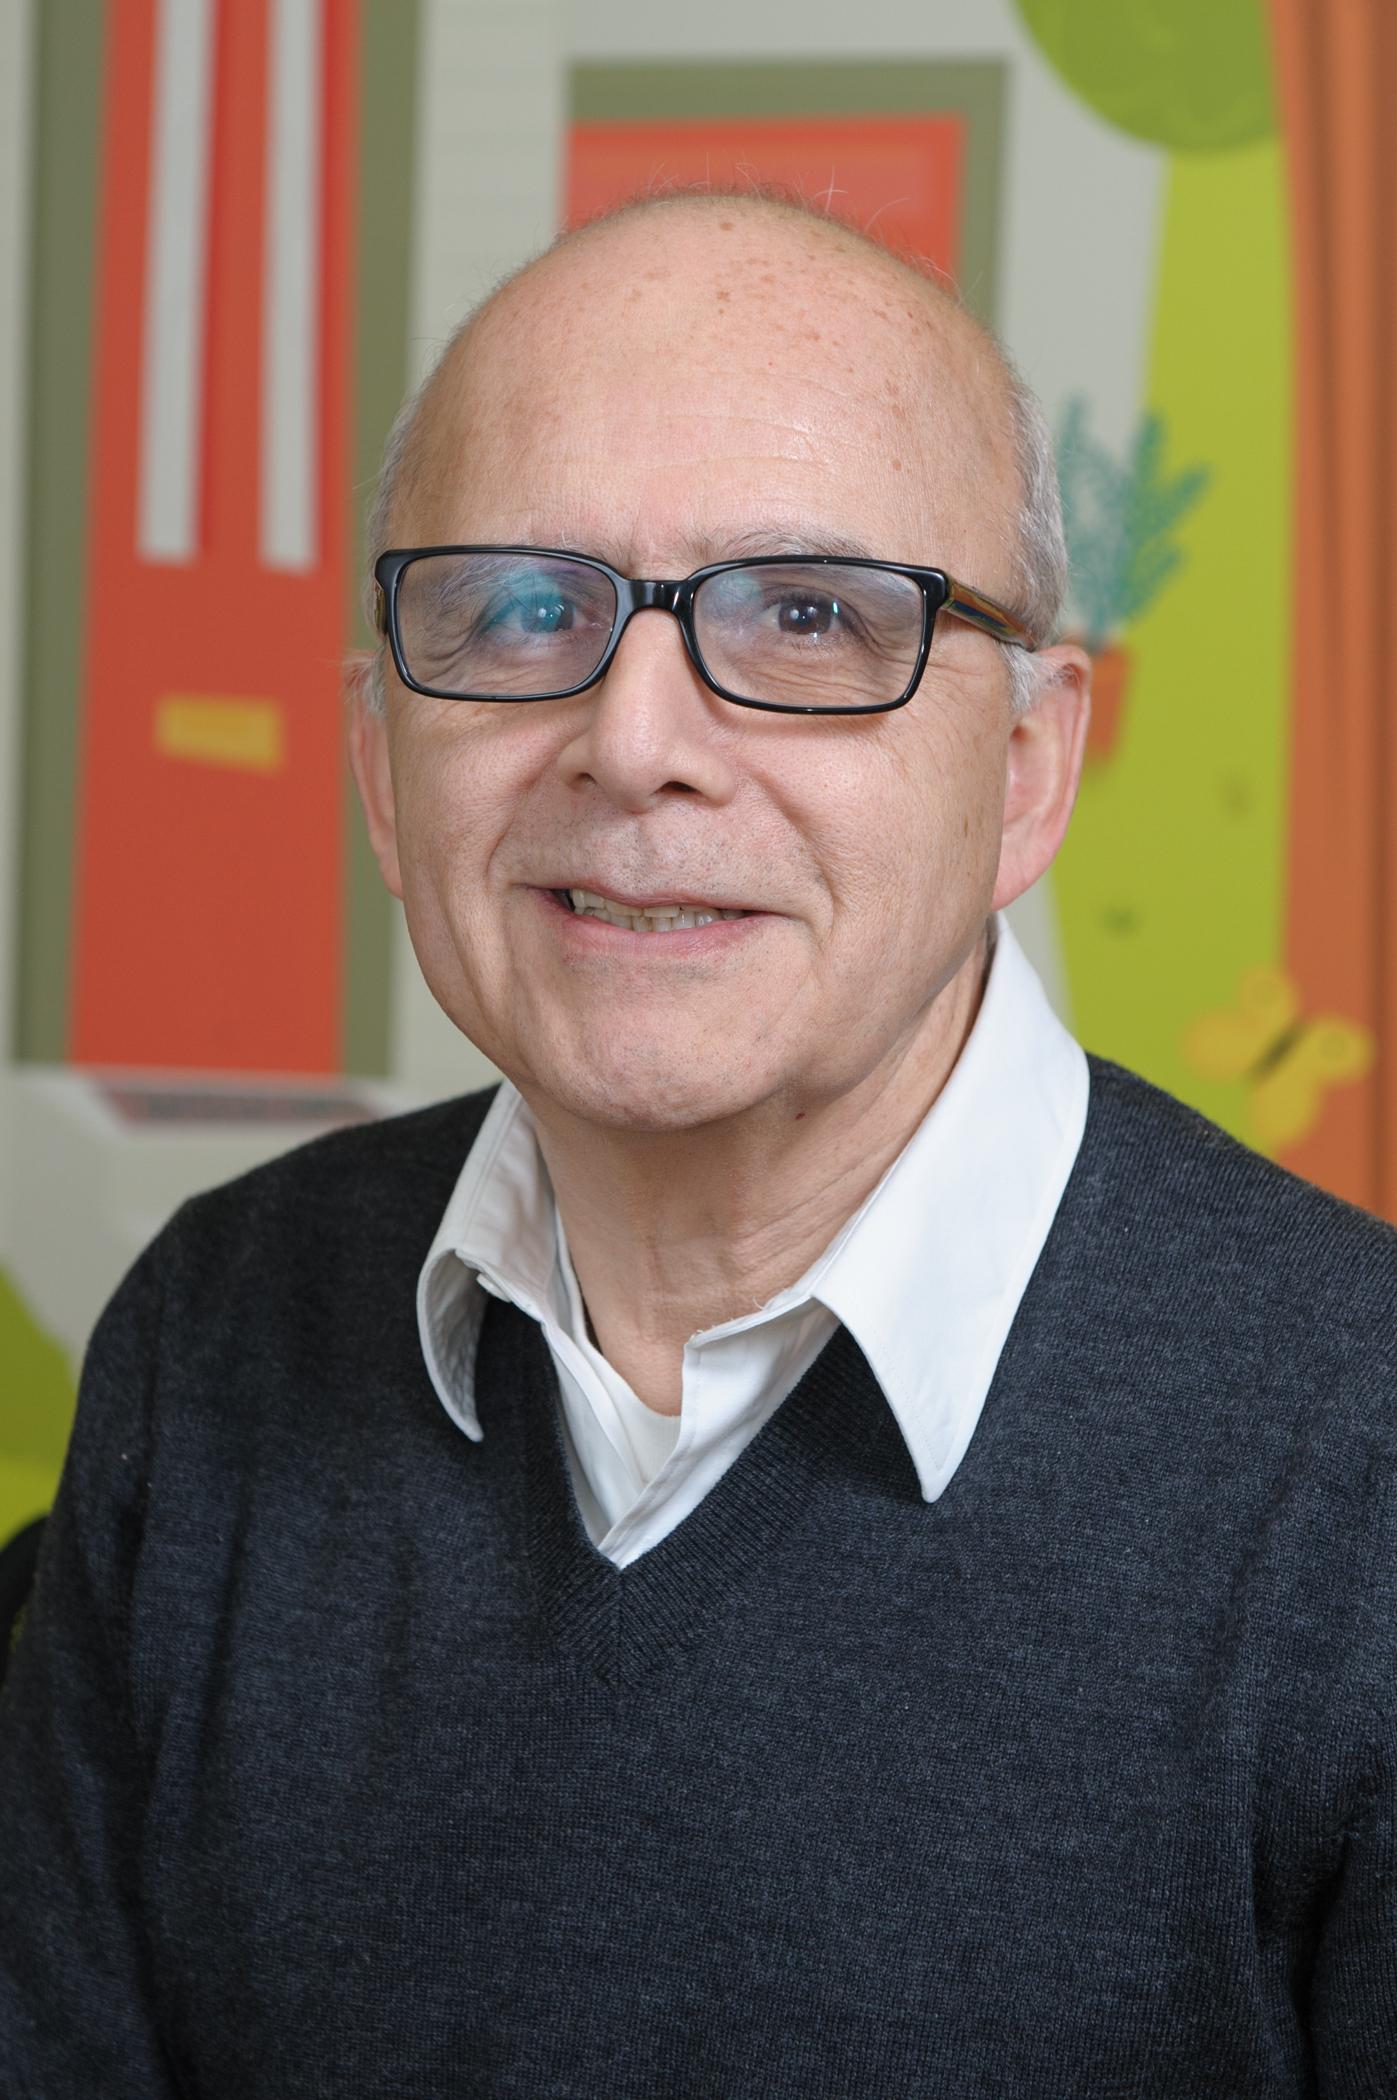 Humberto Carlos